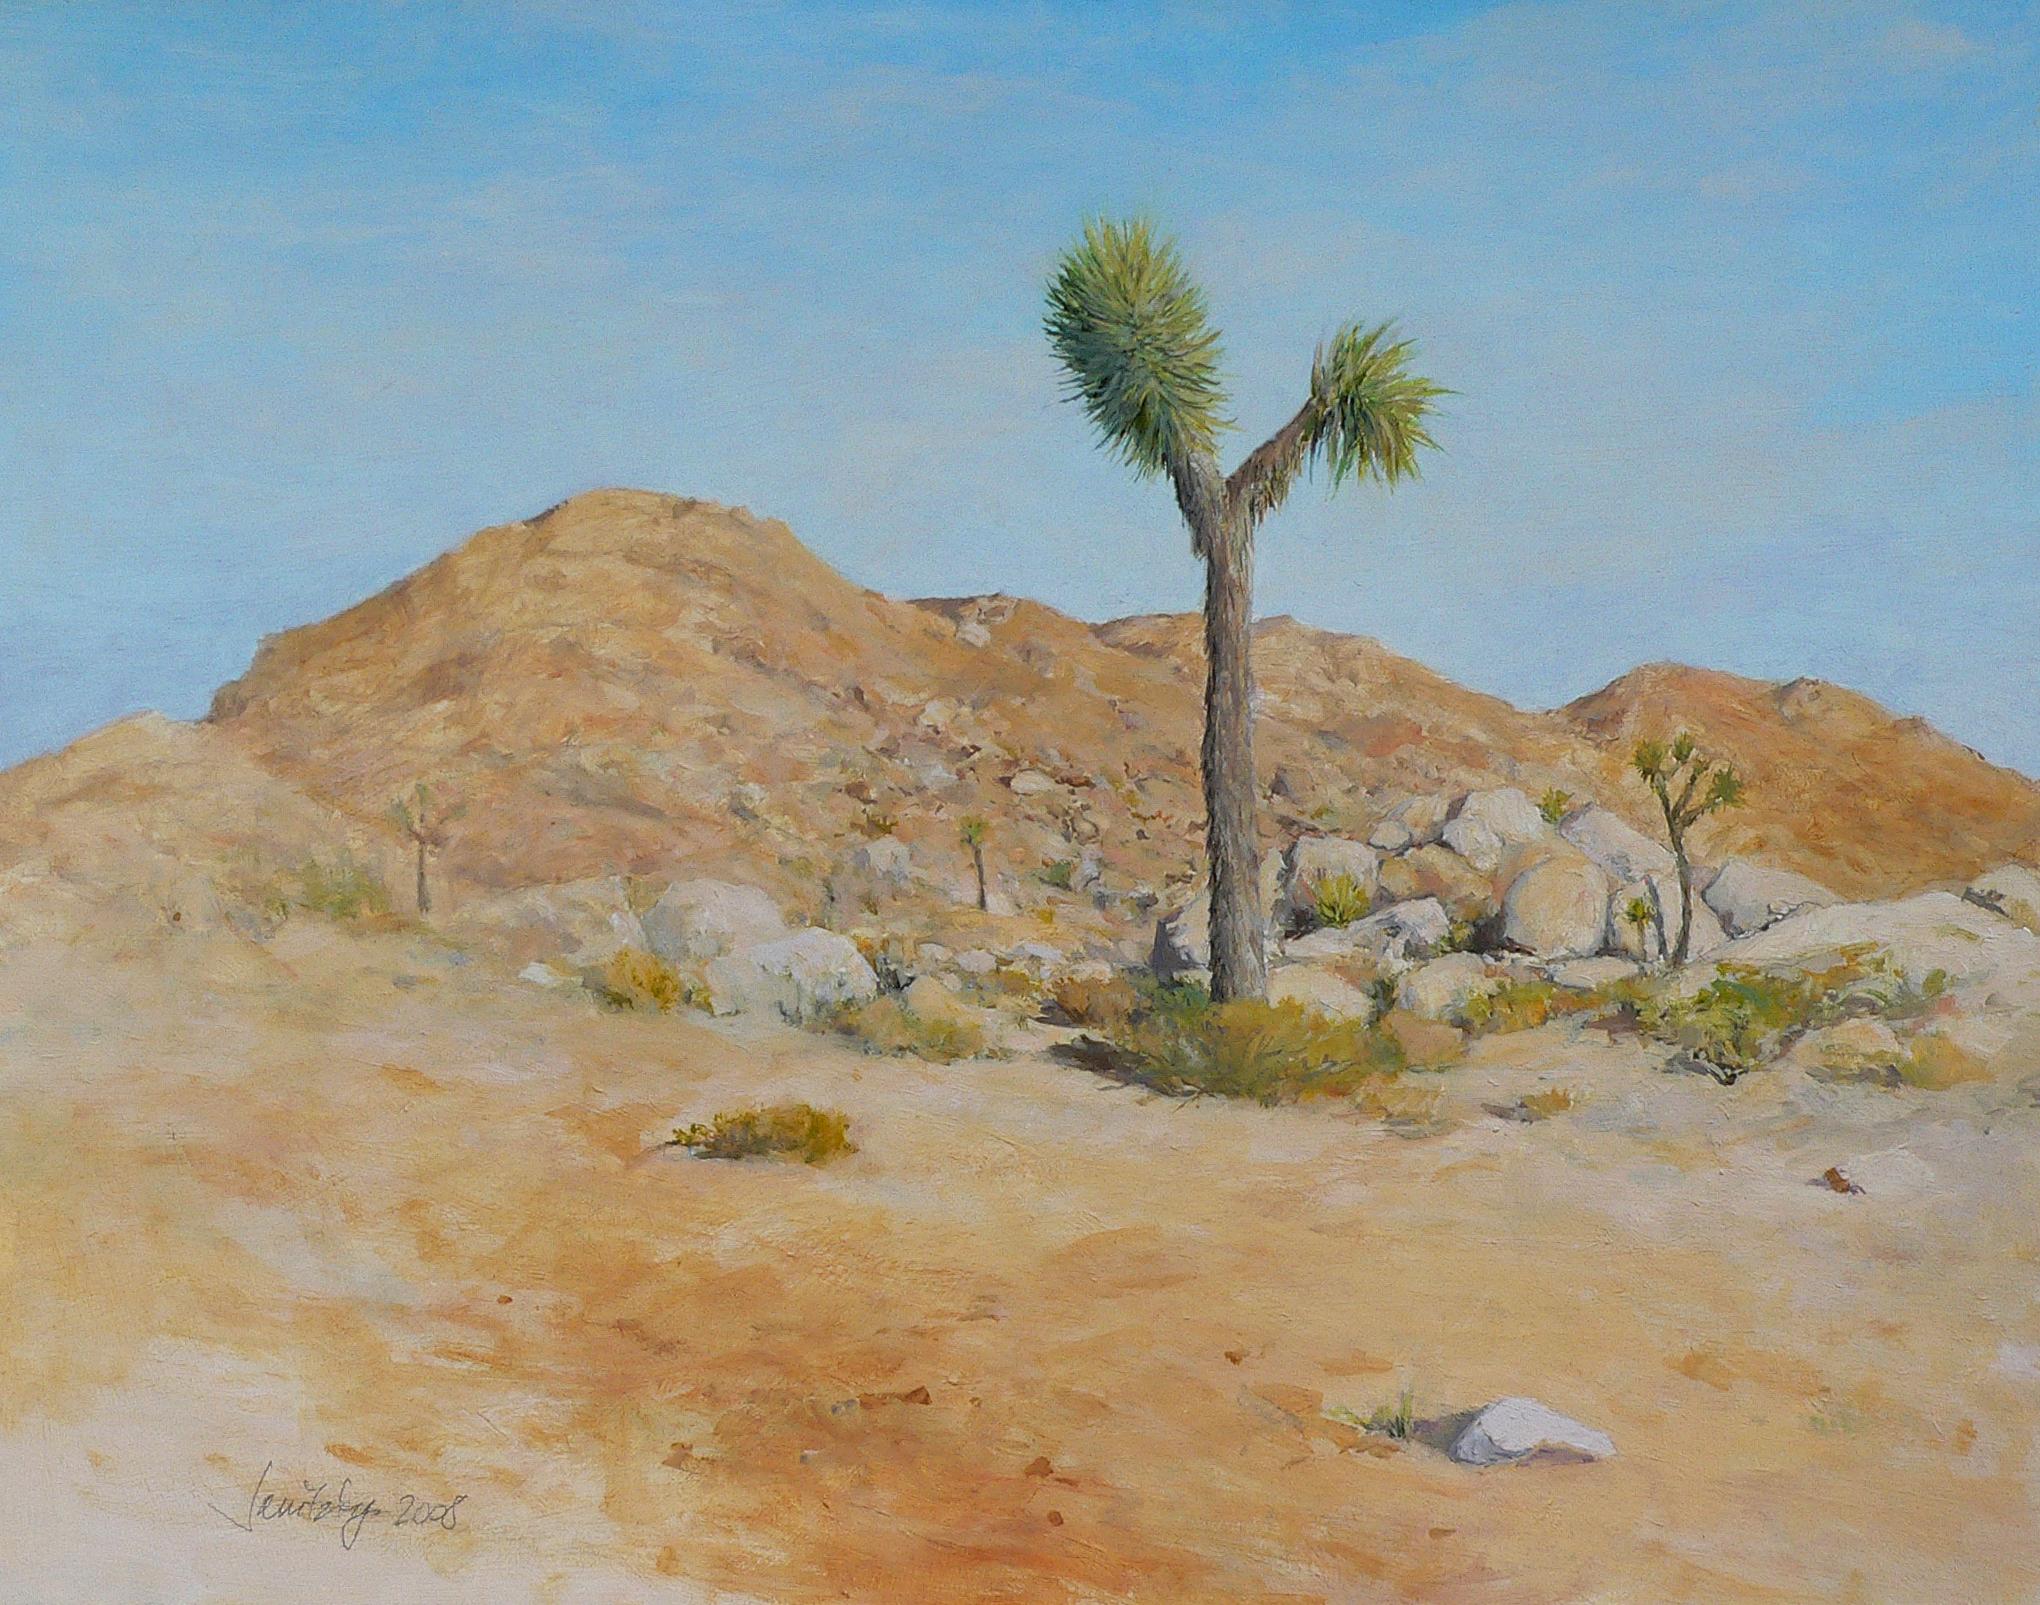 Rocks and Young Joshua Tree.